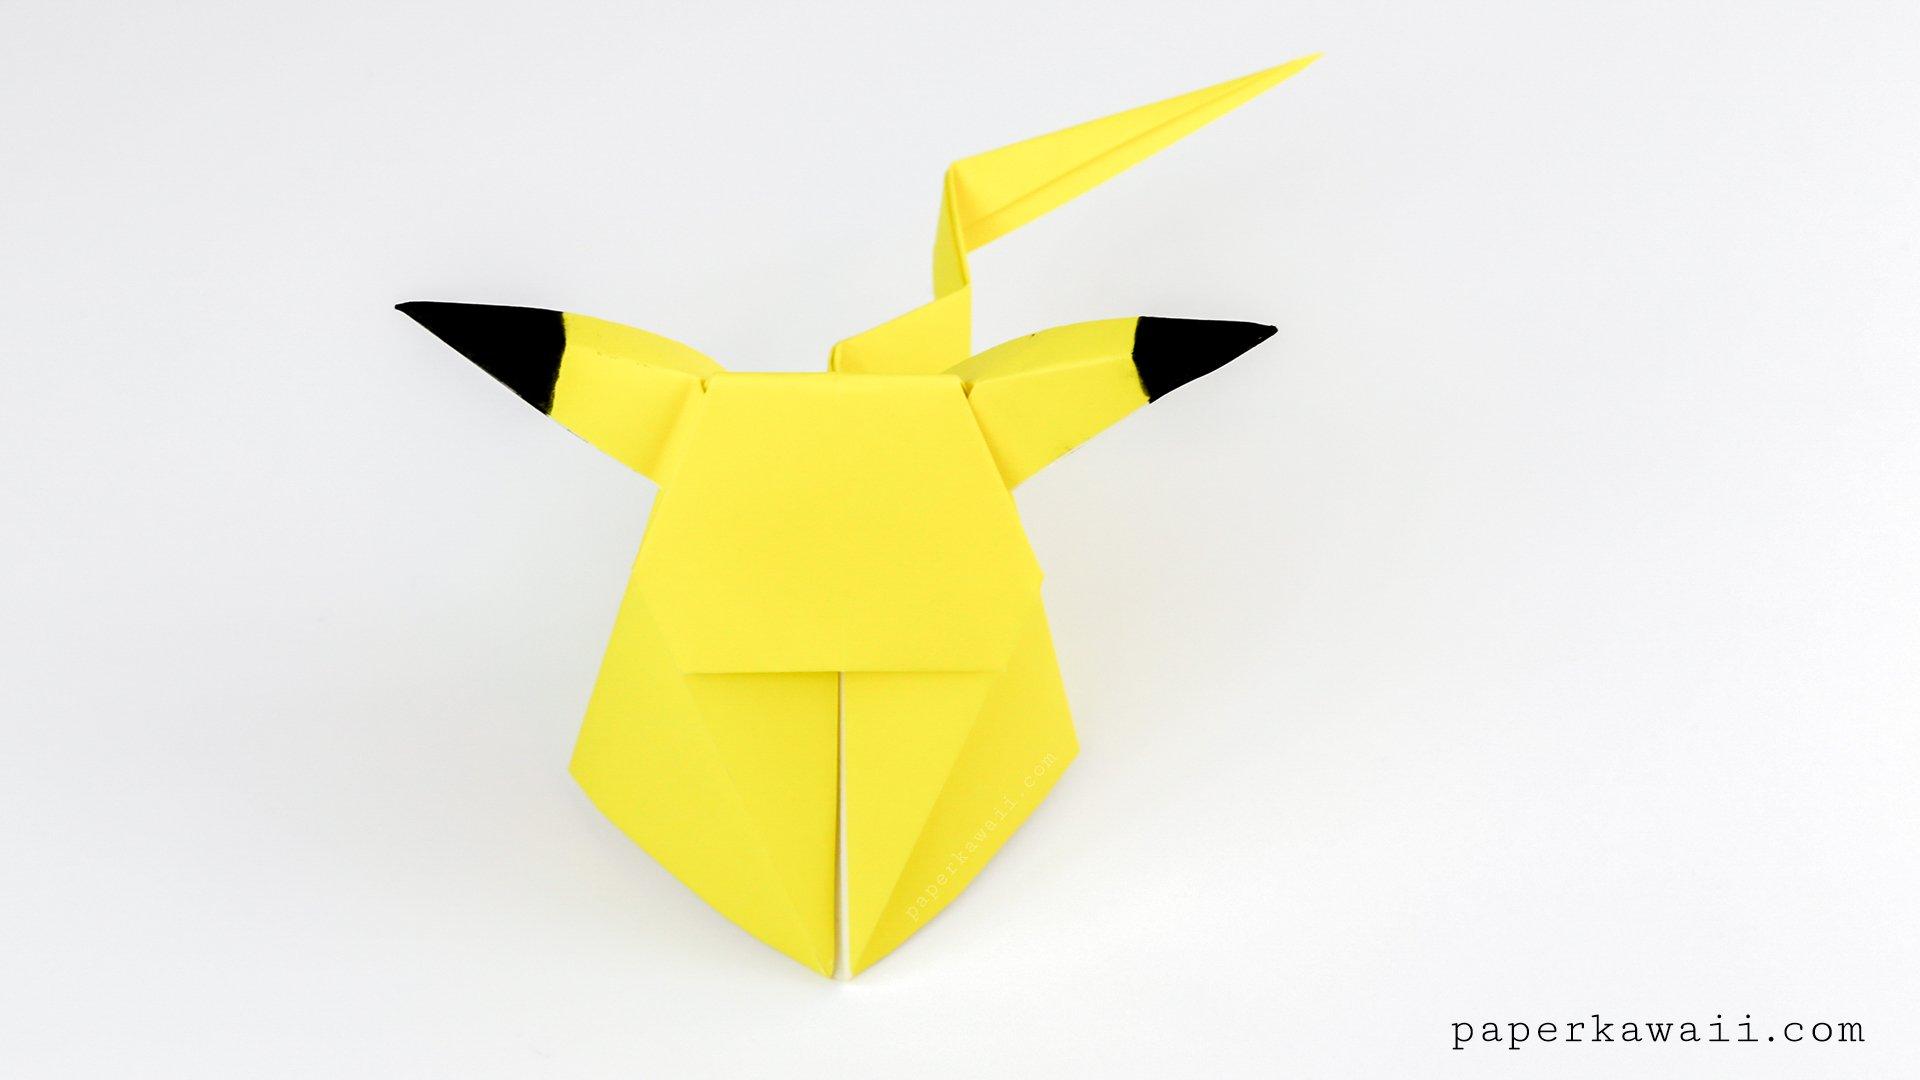 Origami Pikachu Tutorial - Cute Origami Pokemon! - Paper Kawaii